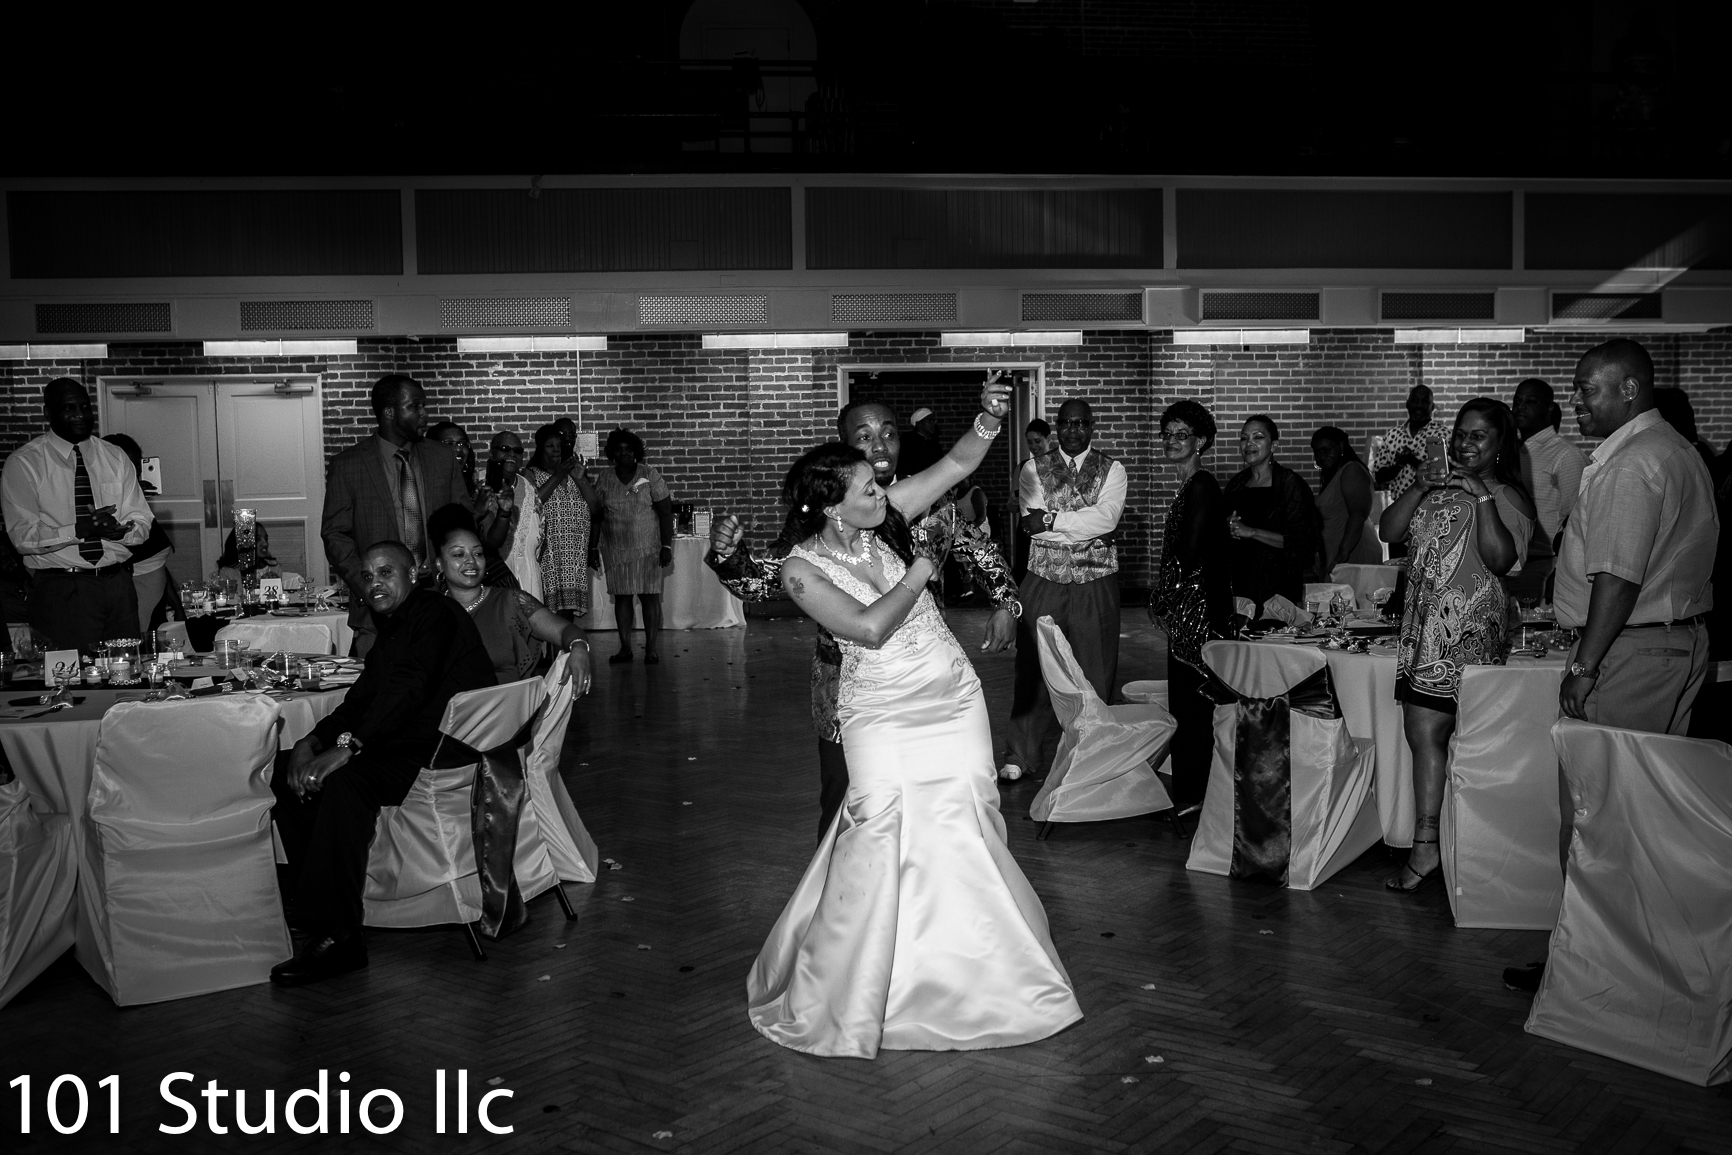 Raleigh  wedding photographer - 101 Studio llc -13.jpg